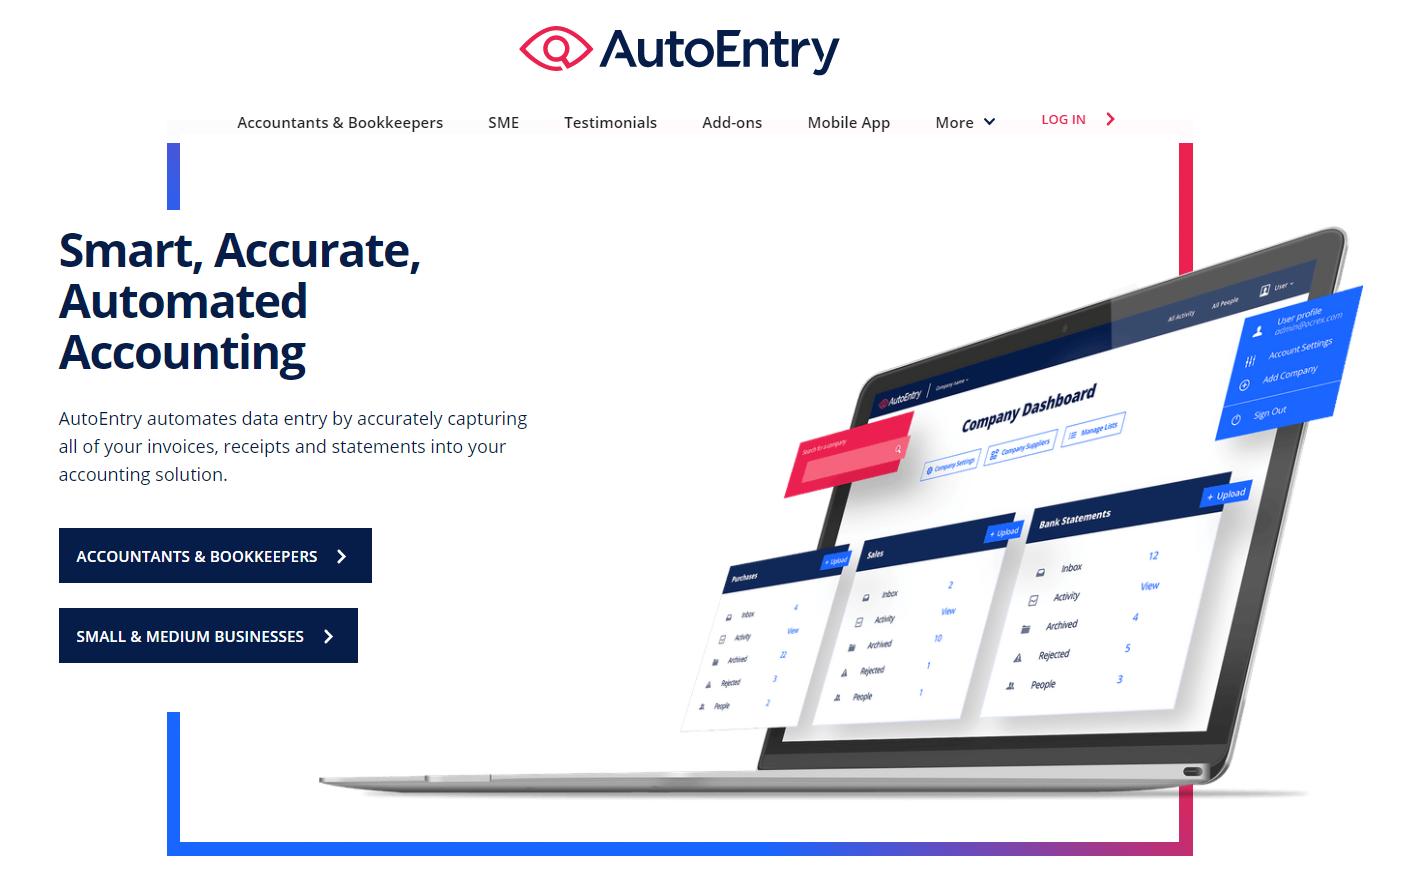 AutoEntry Homepage